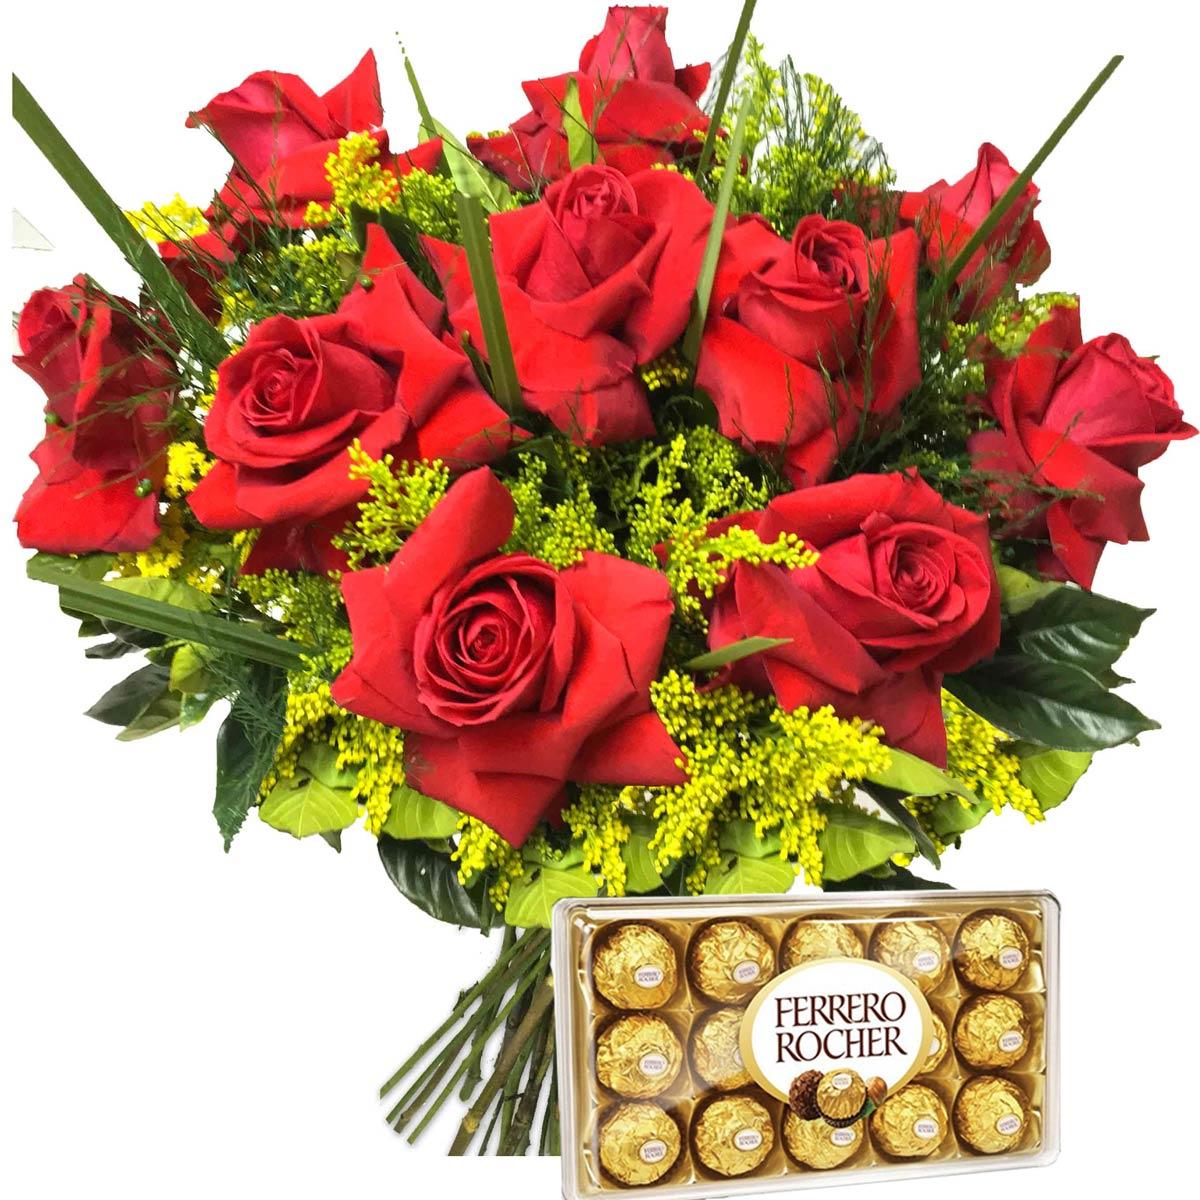 Buquê de 10 Rosas Colombianas e Ferrero